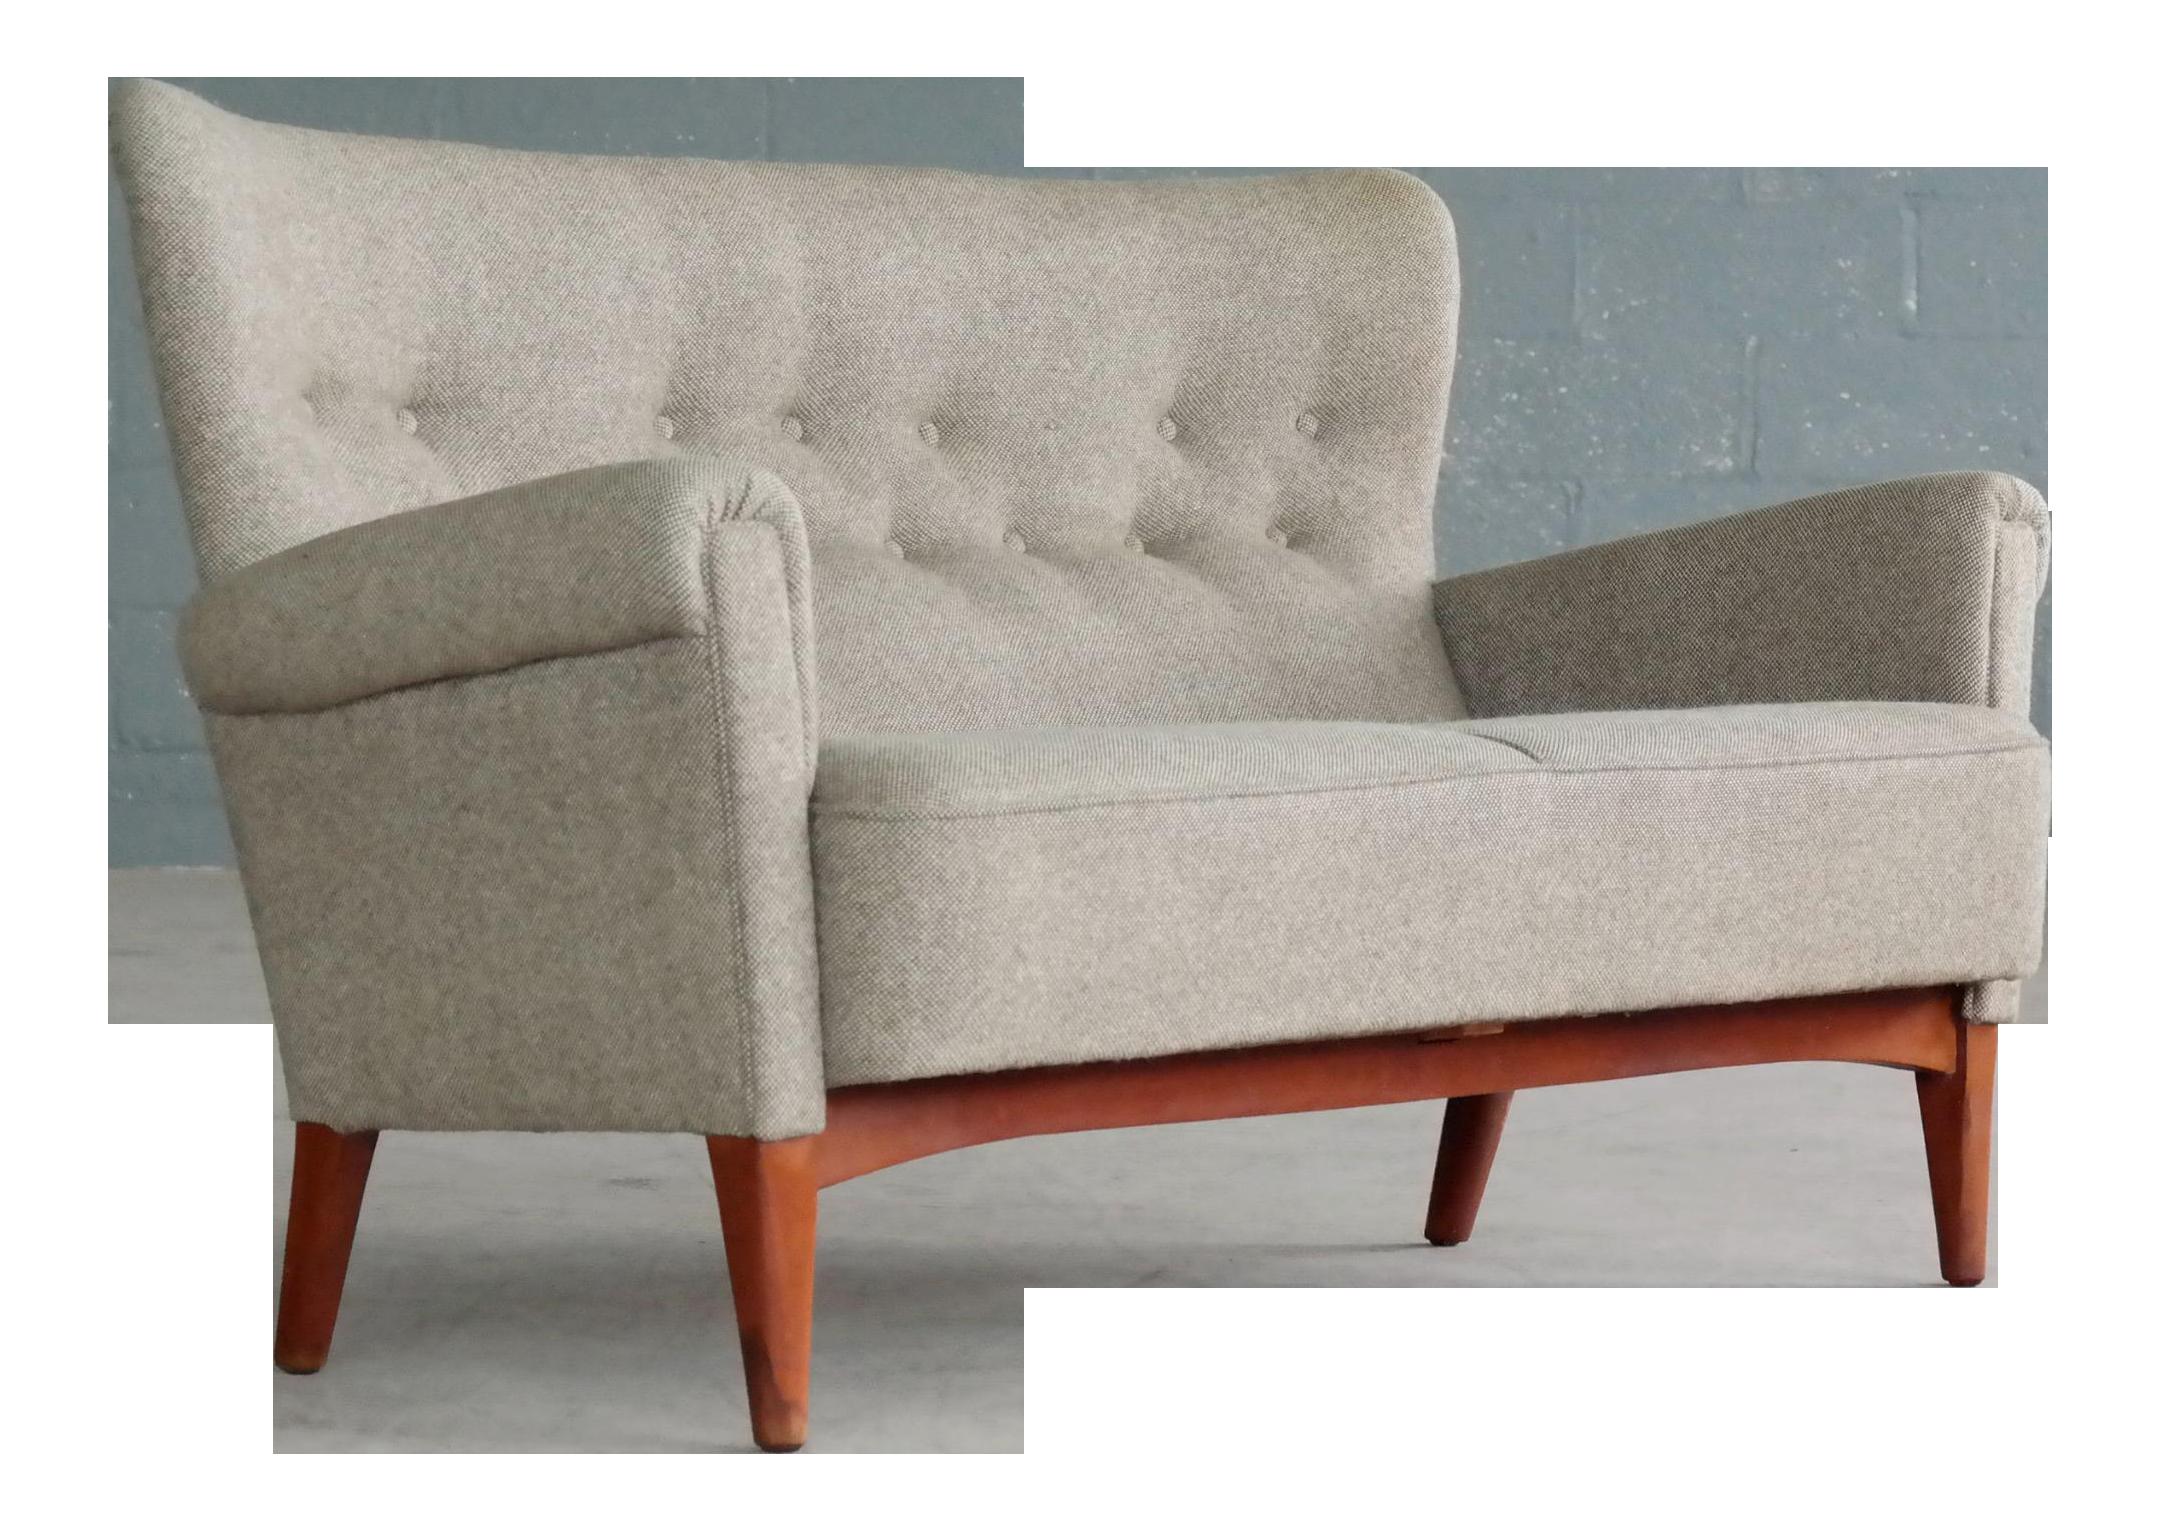 Danish Midcentury Sofa Or Settee In Teak U0026 Gray Wool By Fritz Hansen, Circa  1955